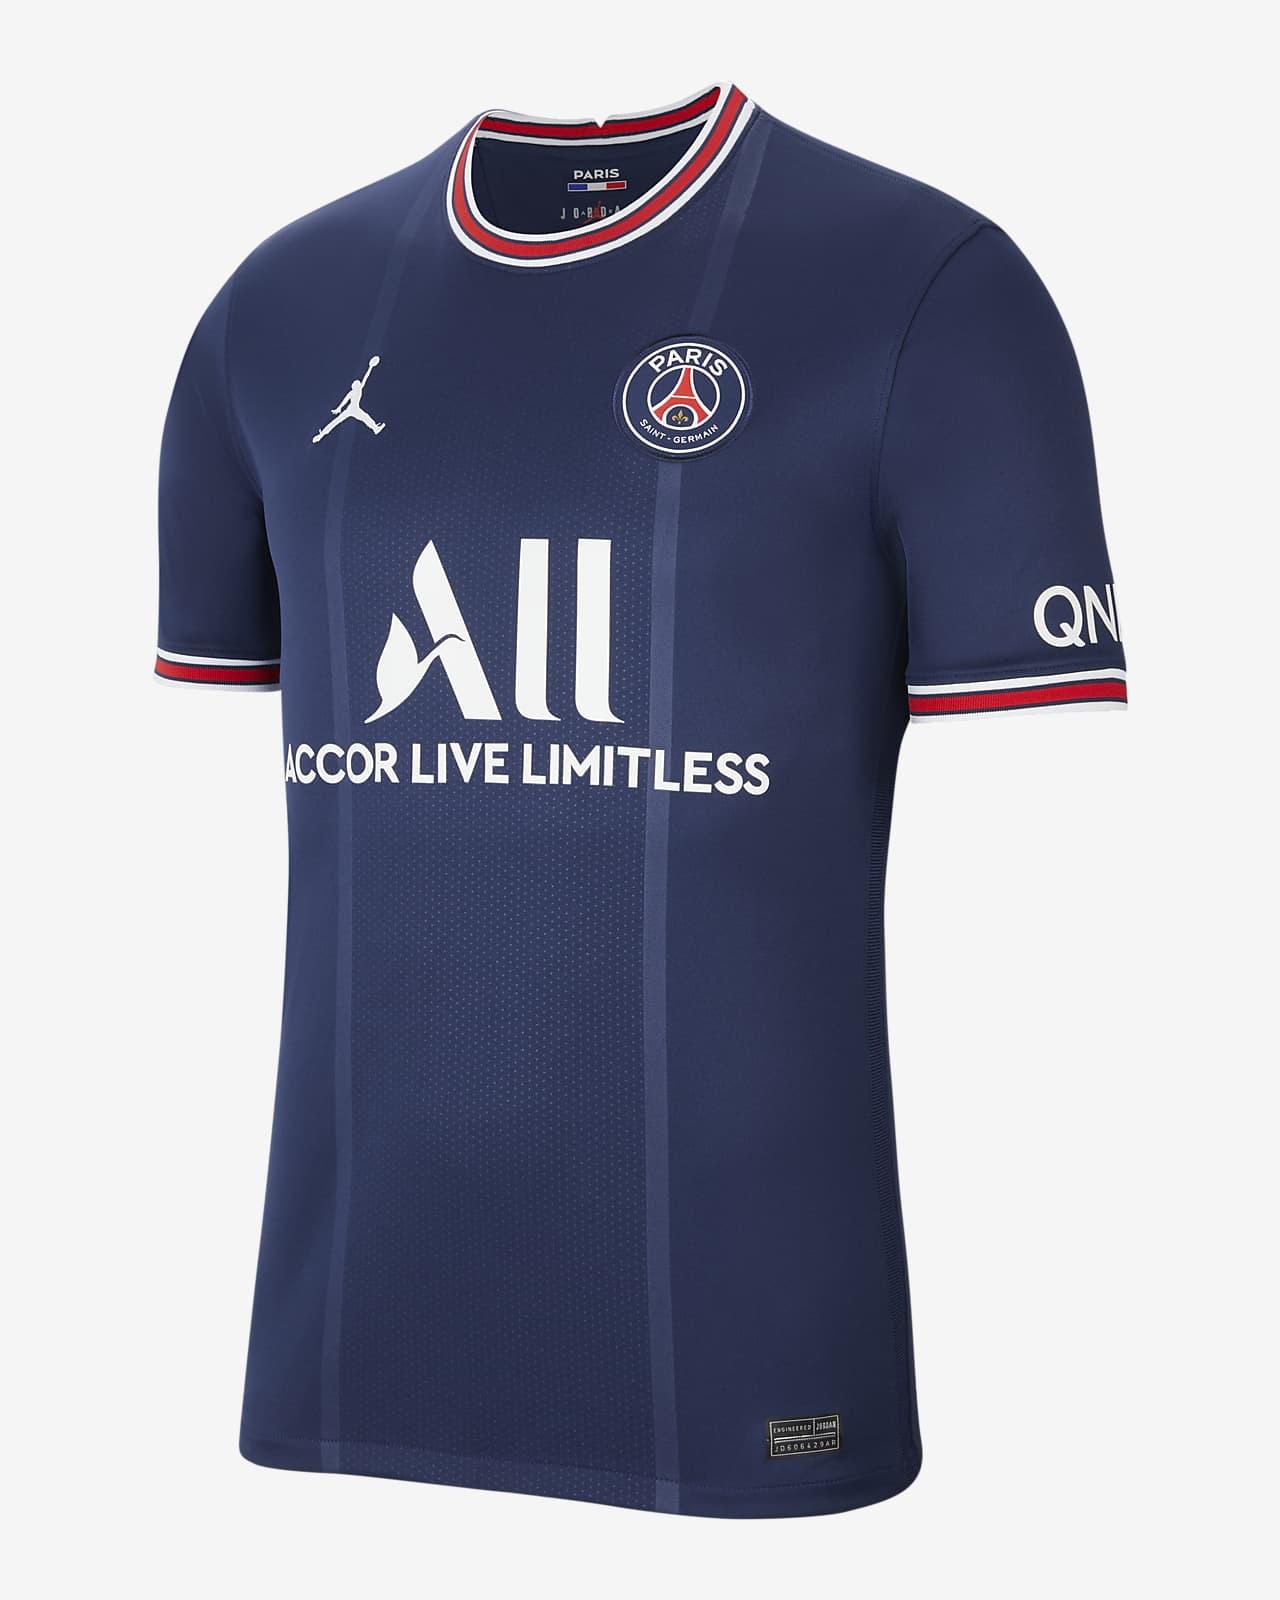 Paris Saint-Germain 2021/22 Stadium Home Men's Soccer Jersey